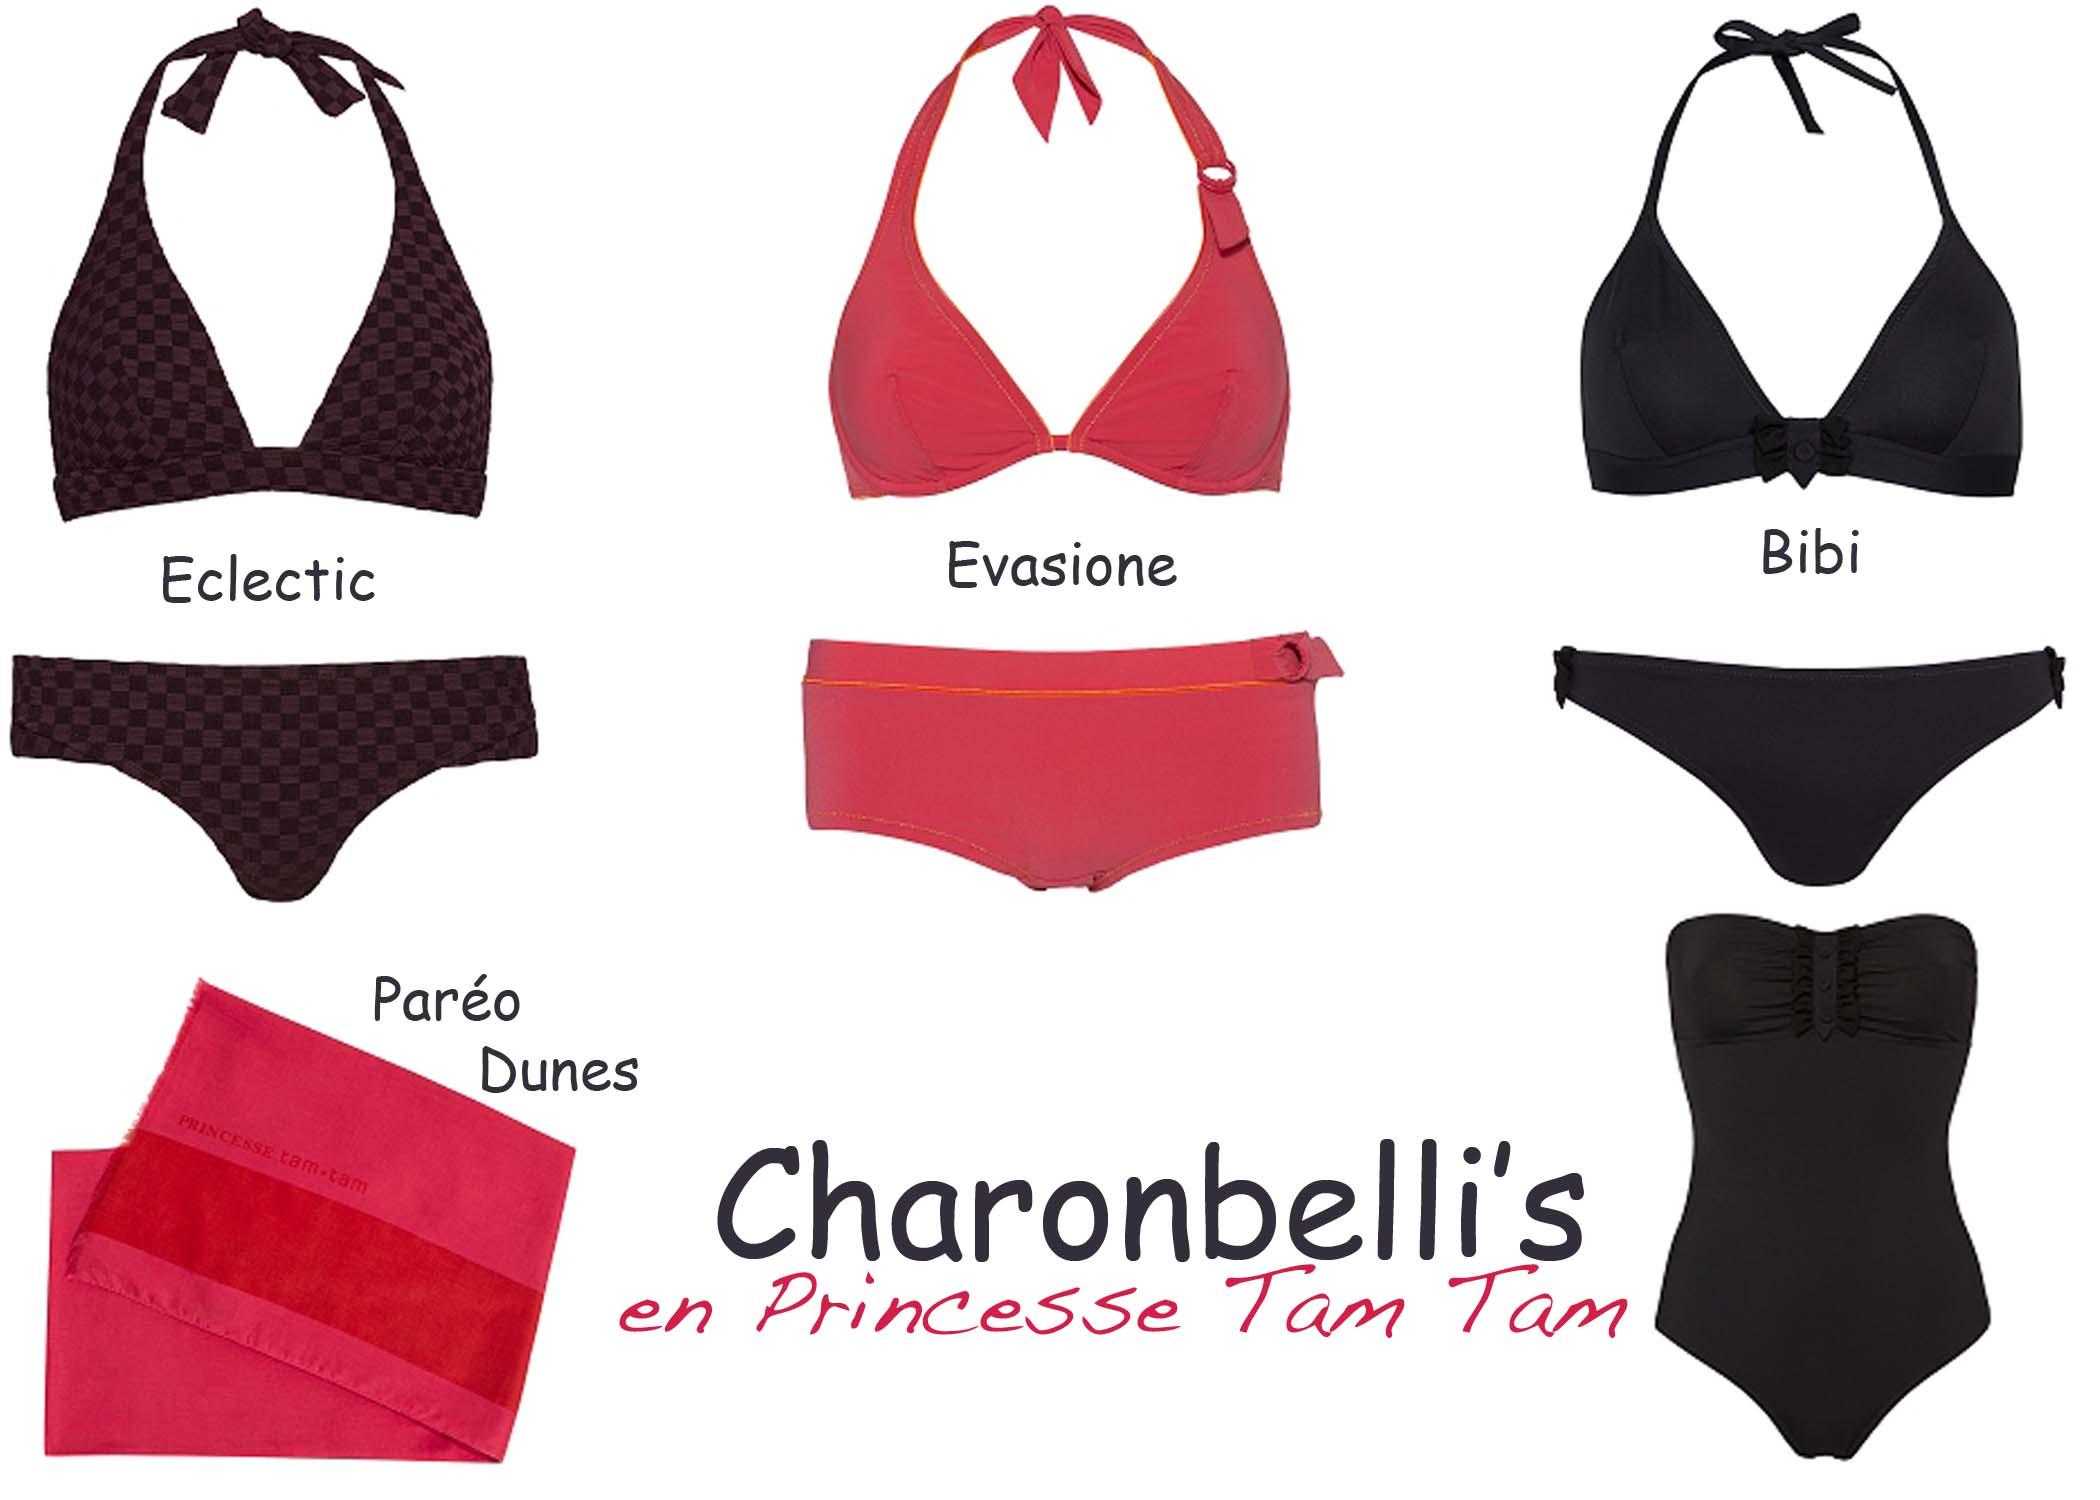 Maillots de bain Princesse Tam Tam - Charonbelli's blog mode